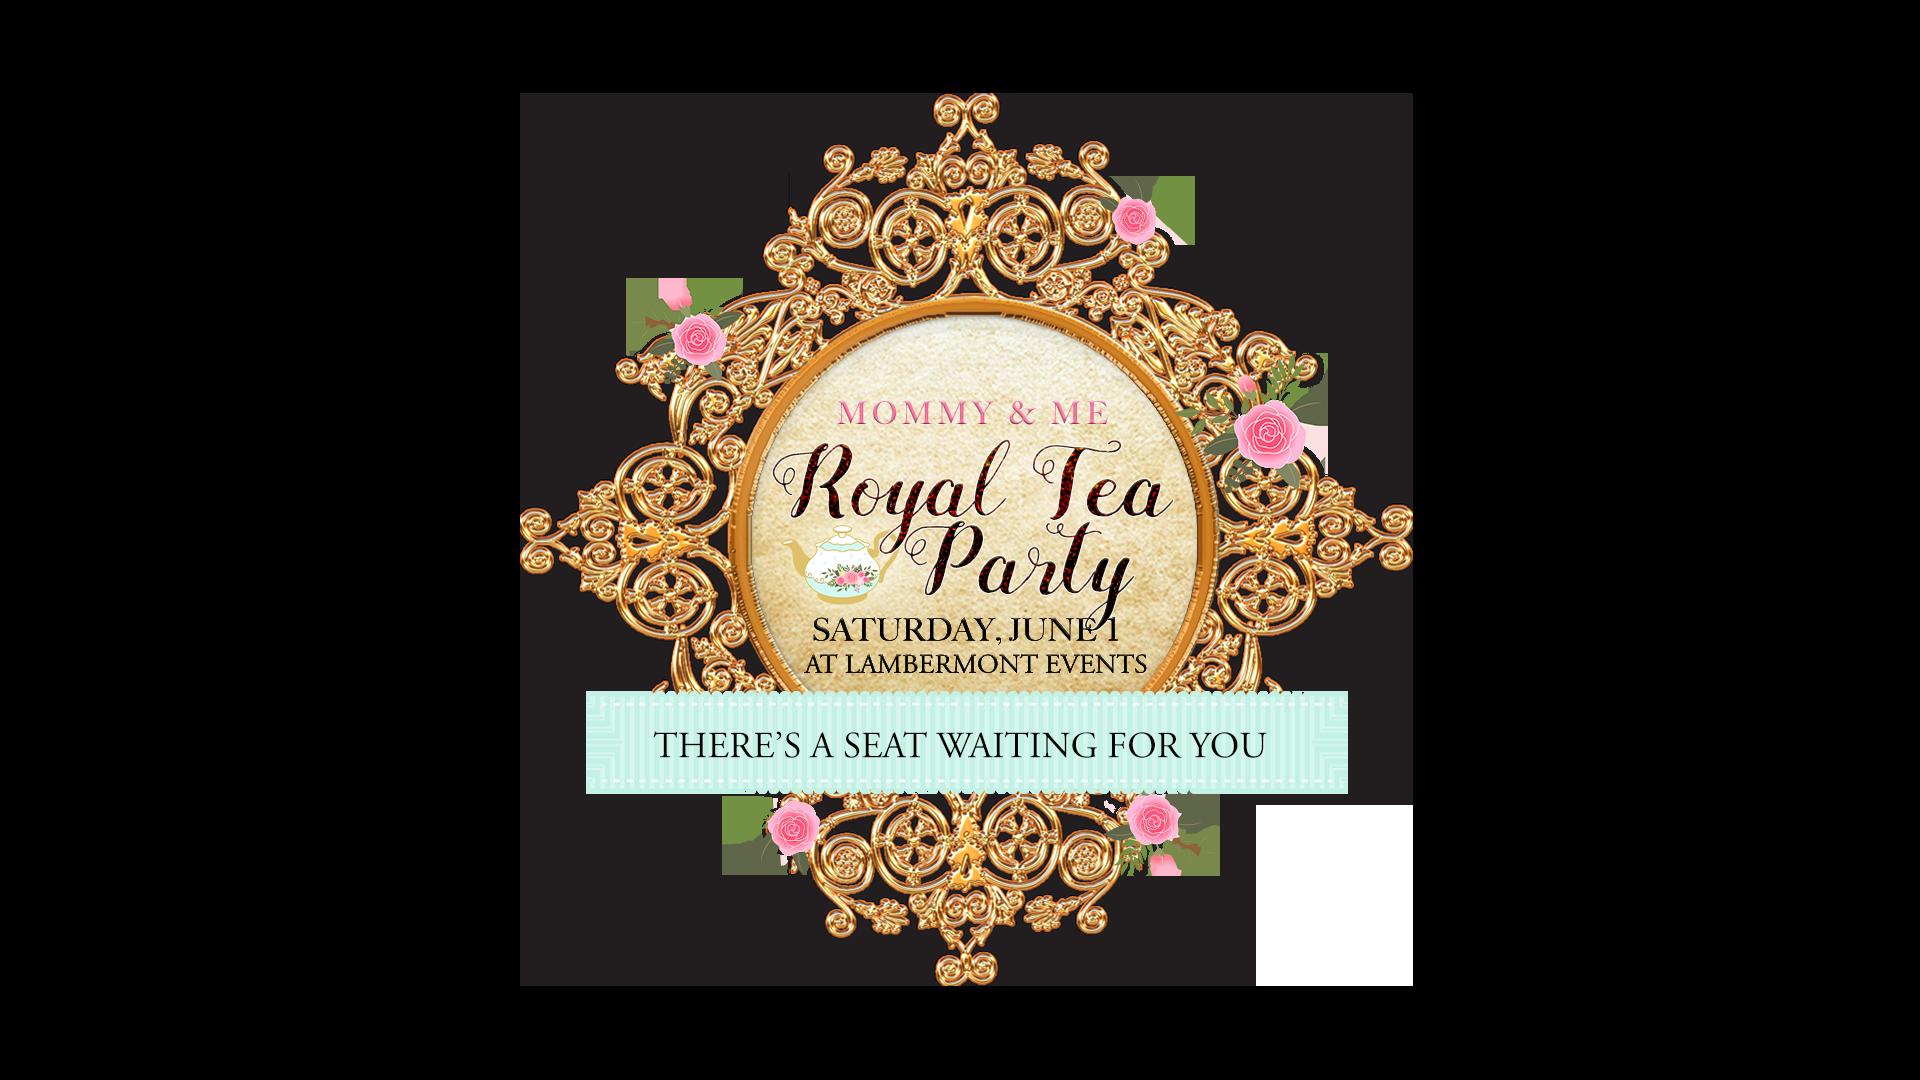 RoyalTeaParty_logo2.png